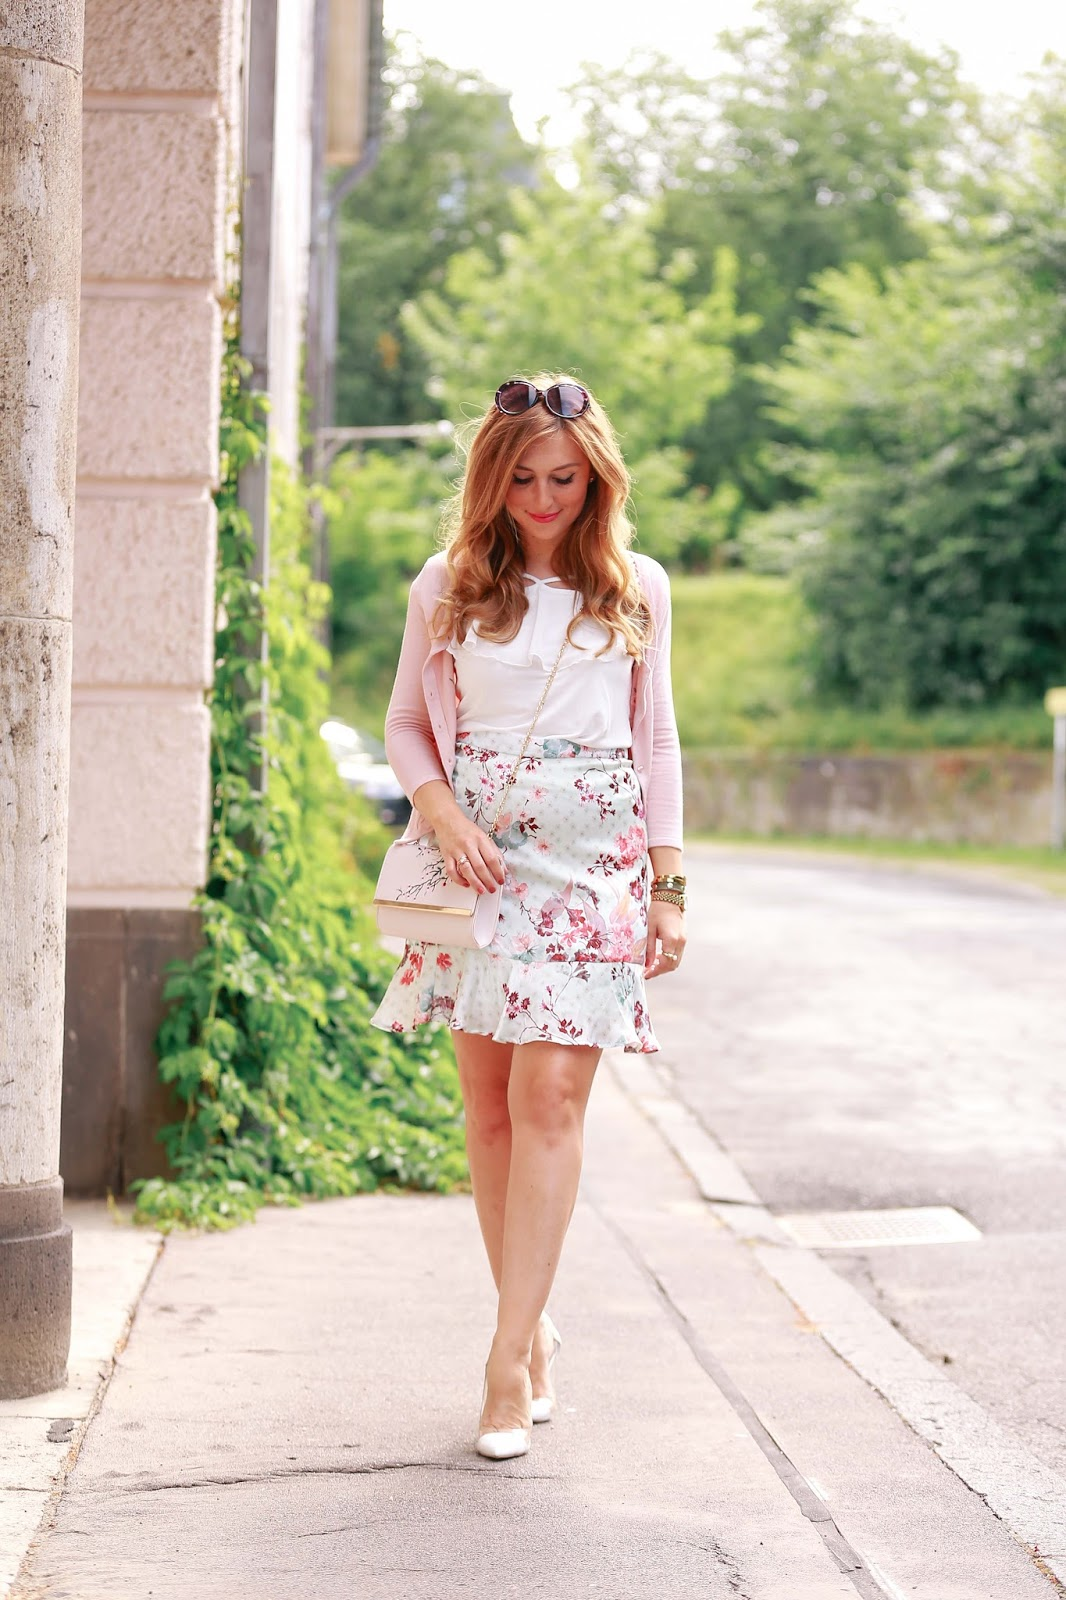 Fashionstylebyjohanna-styleblog-Blogger-aus-Deutschland-Orsay-dress